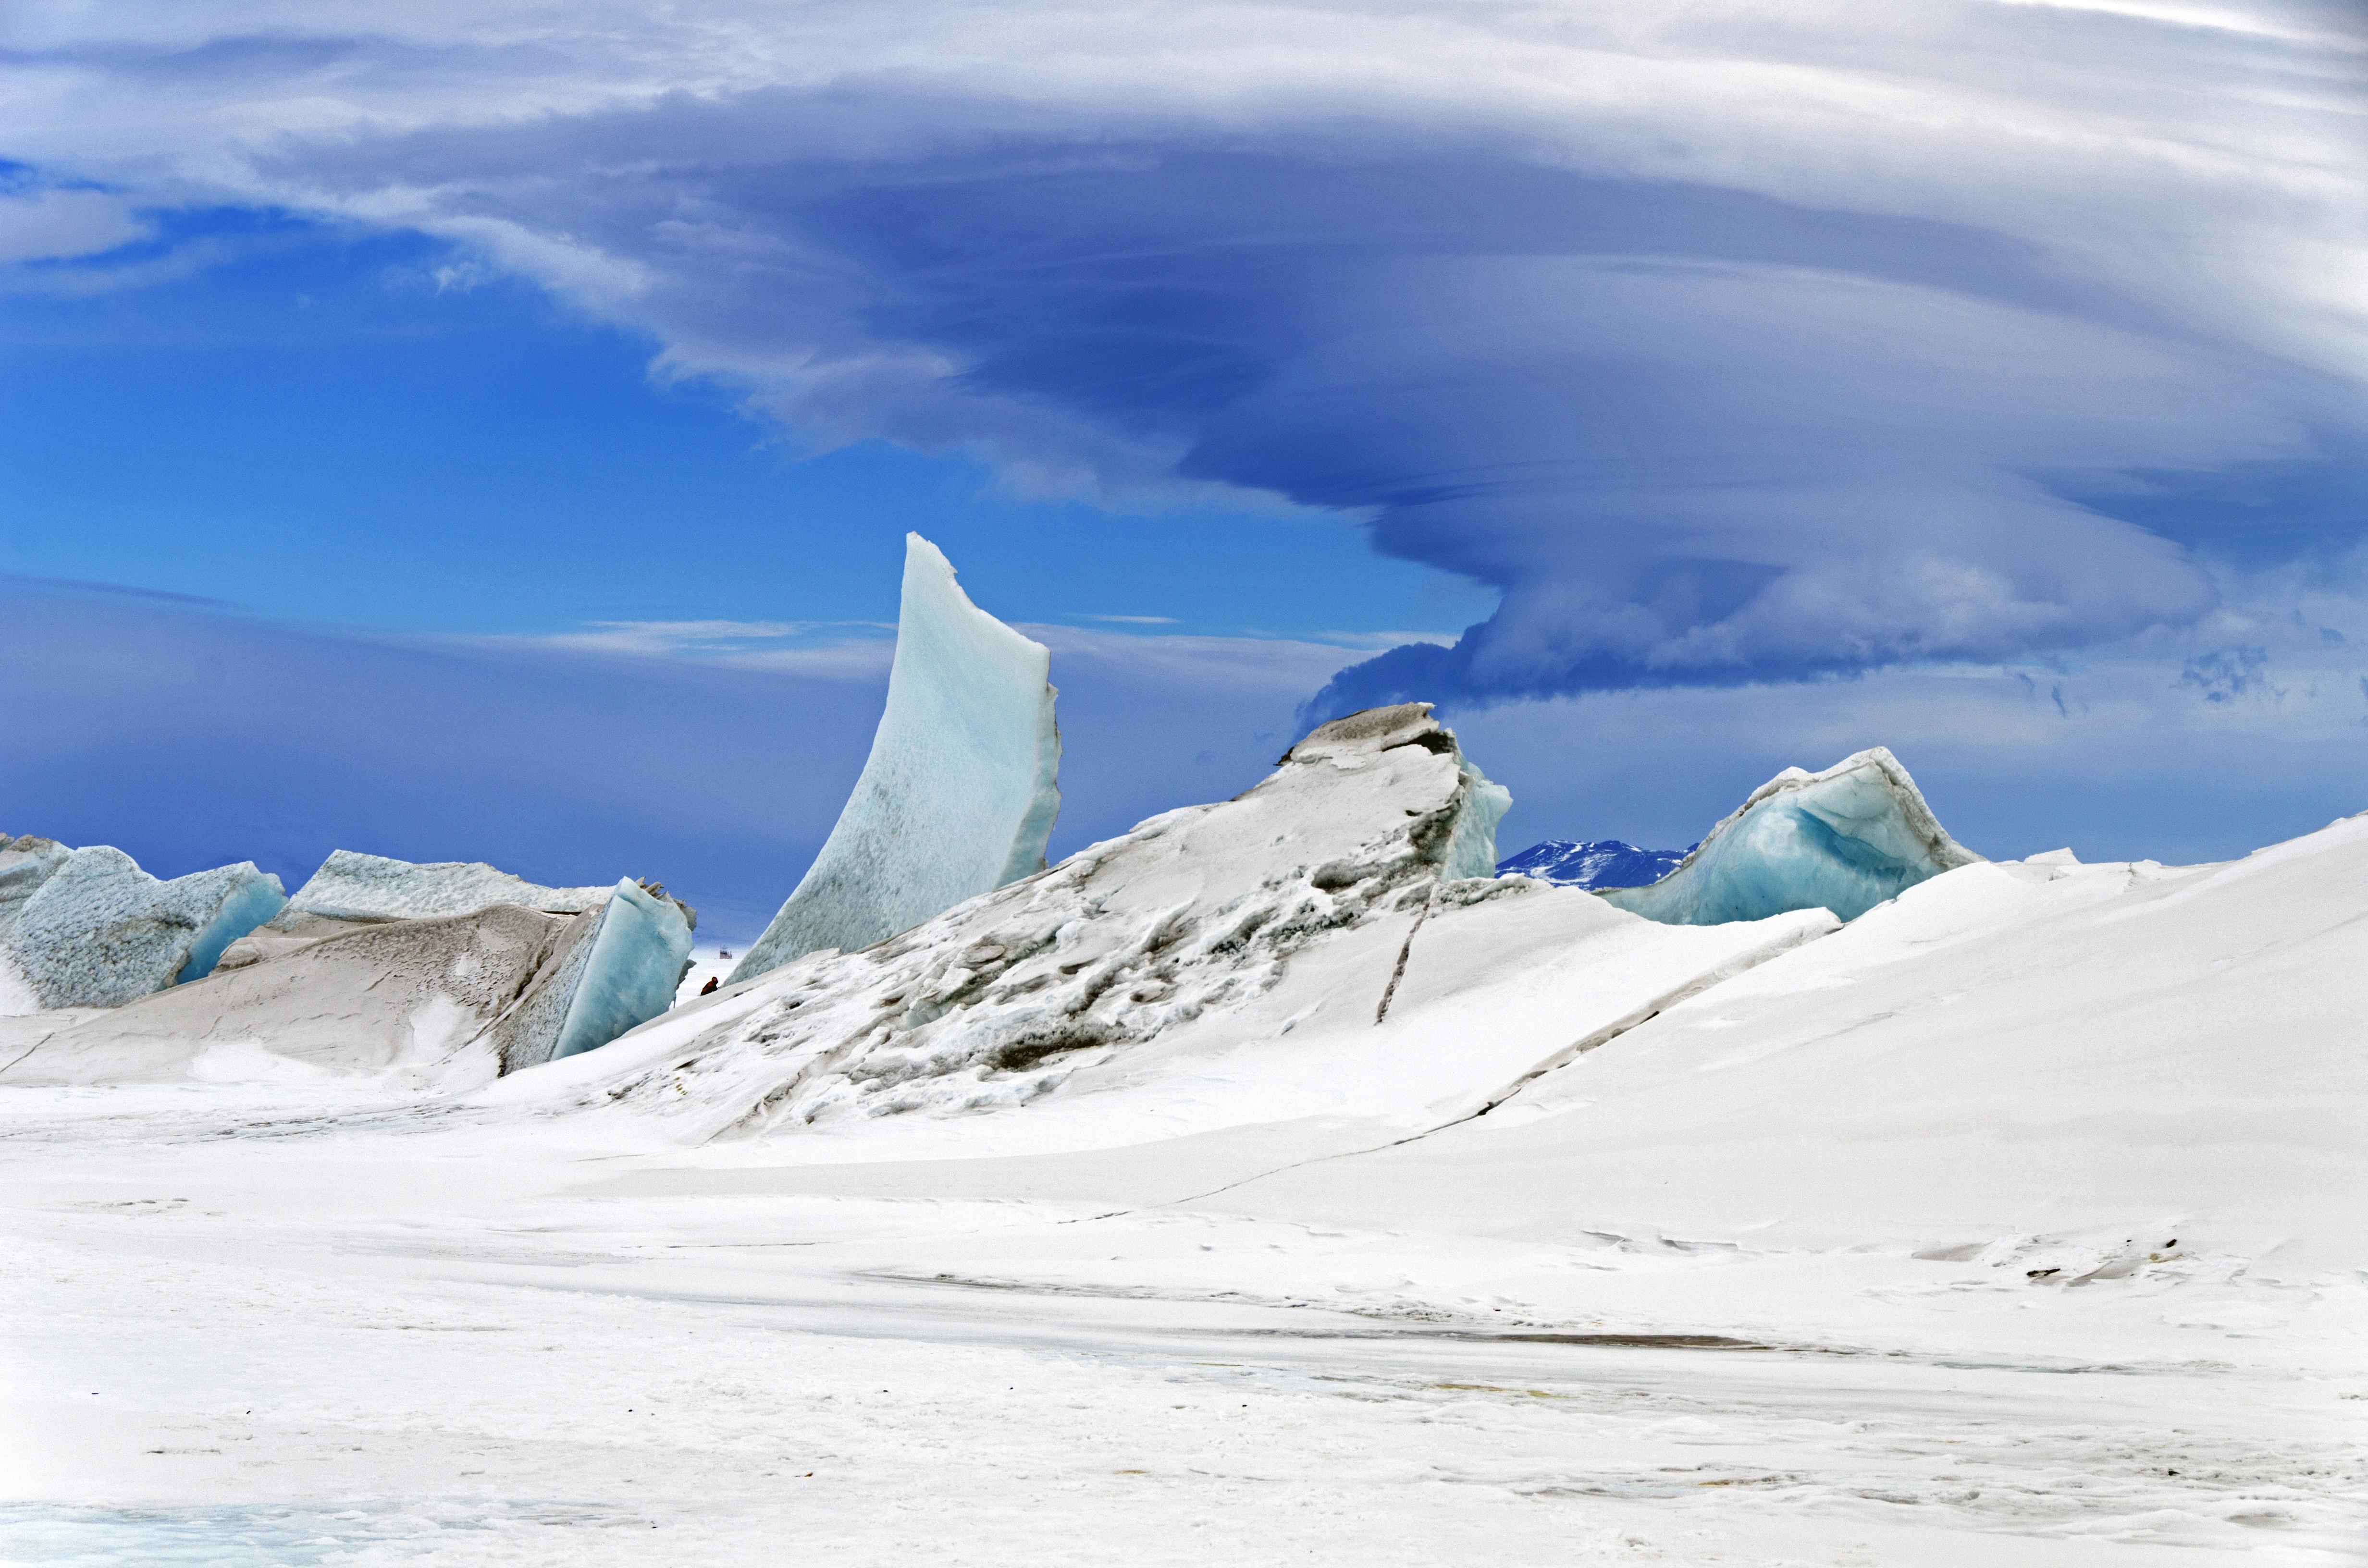 IceBridge Antarctic 2013 Image Gallery | NASA